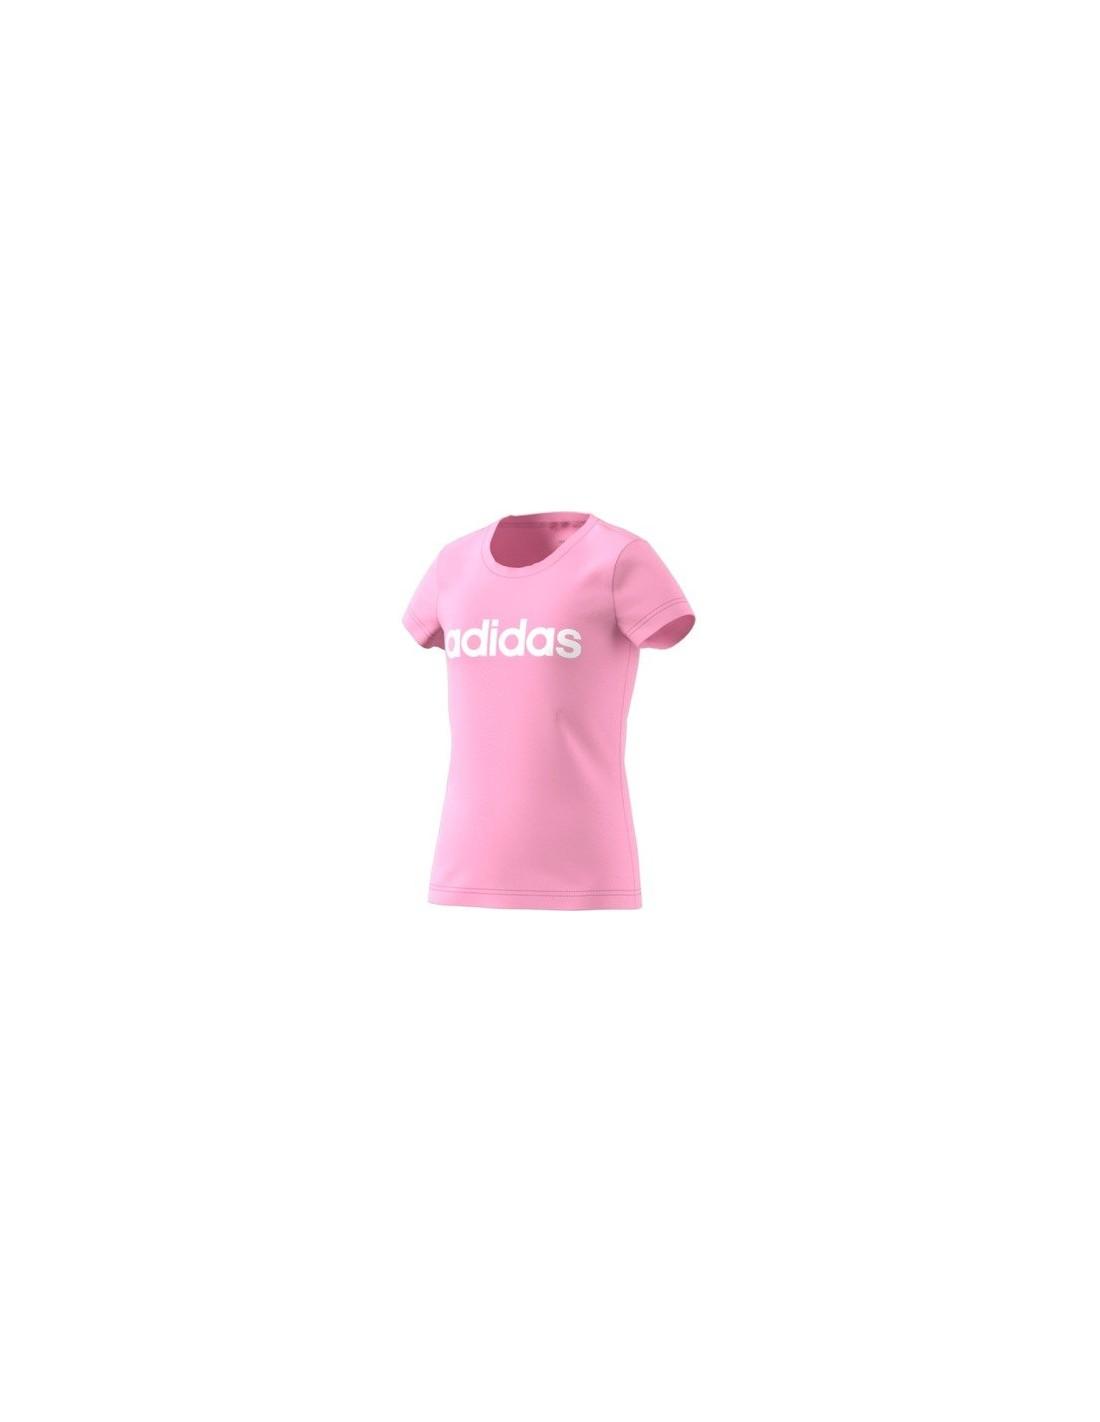 de5adc98 T-skjorter Barn Adidas Youth Girl Lin Tee DV0363 ...